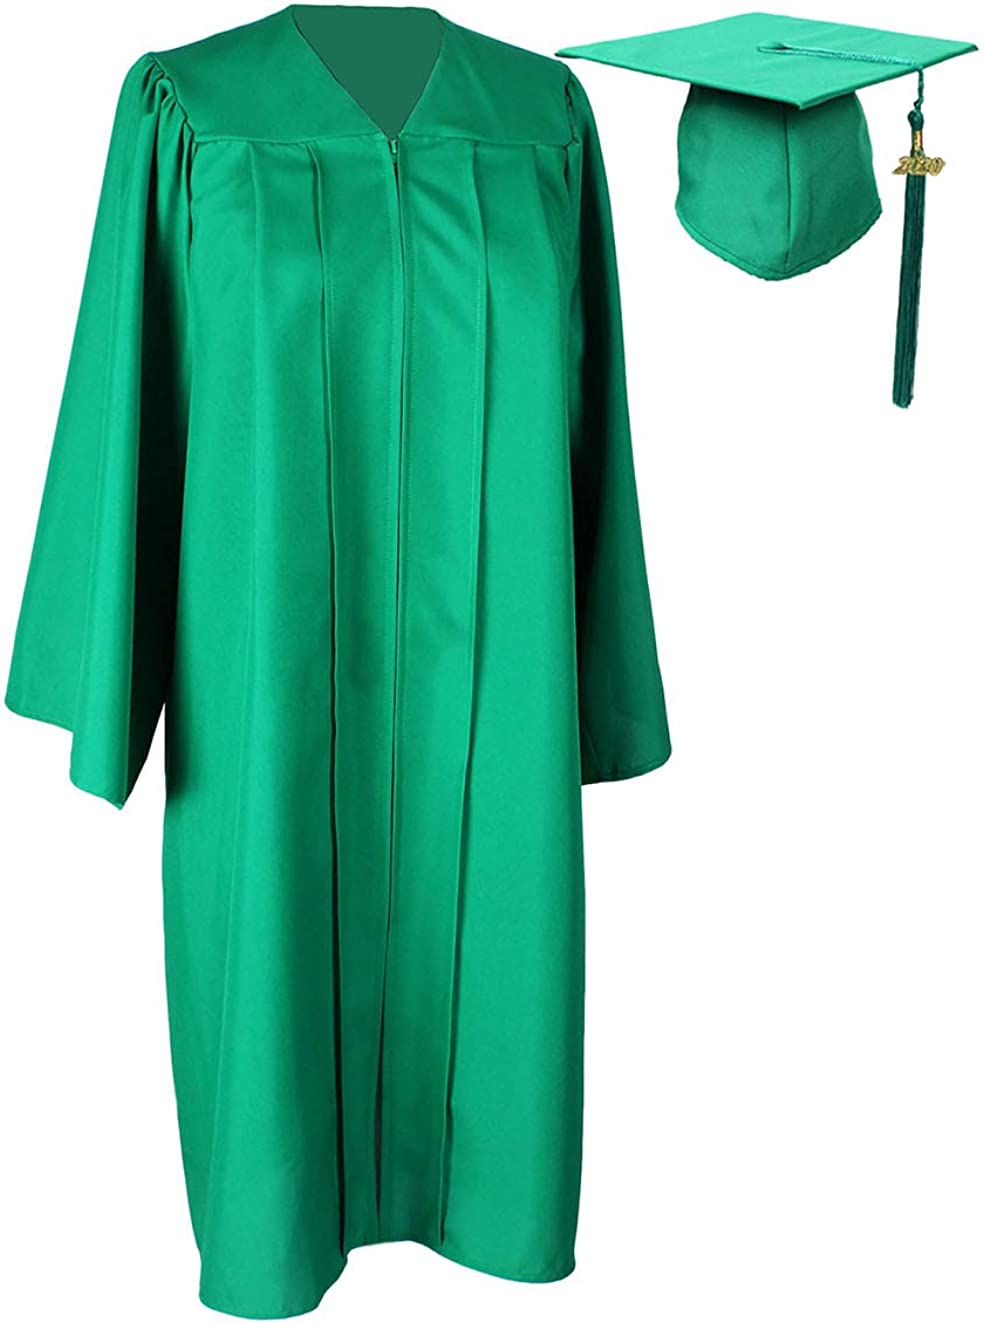 HEPNA Uniforms Graduation Cap Tassel for Graduation Photo,Emerald Green//White 2020 Update